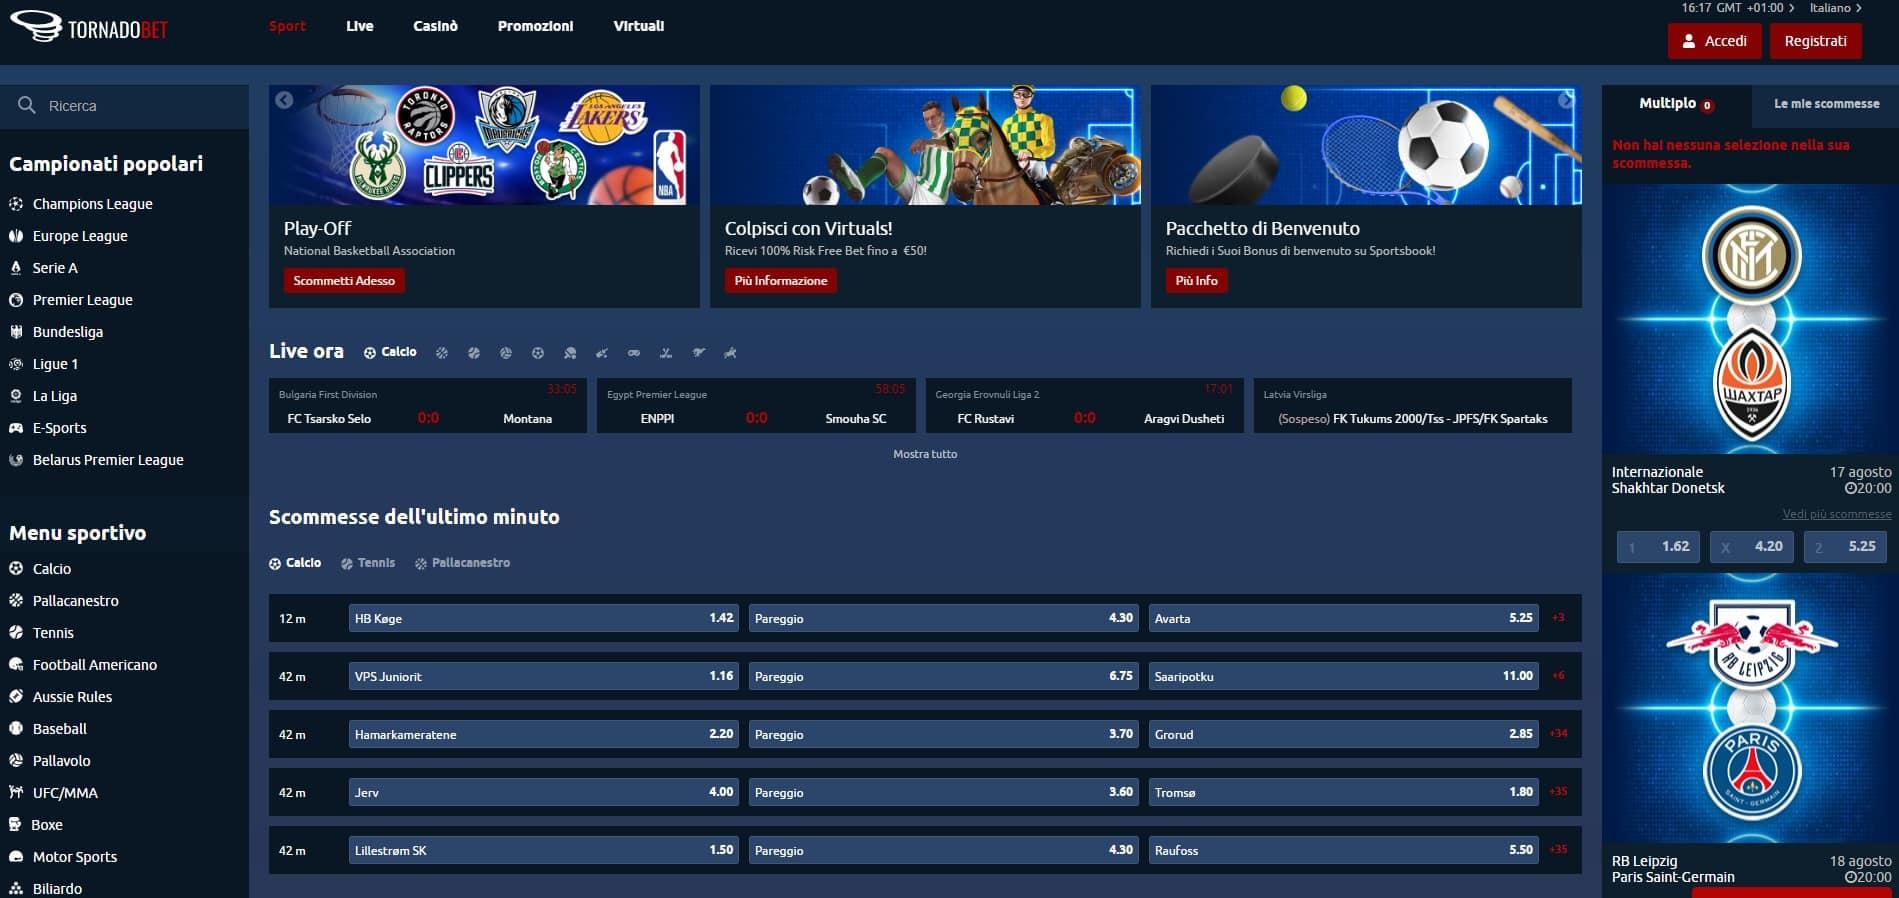 piattaforma scommesse sportive tornado bet recensioni